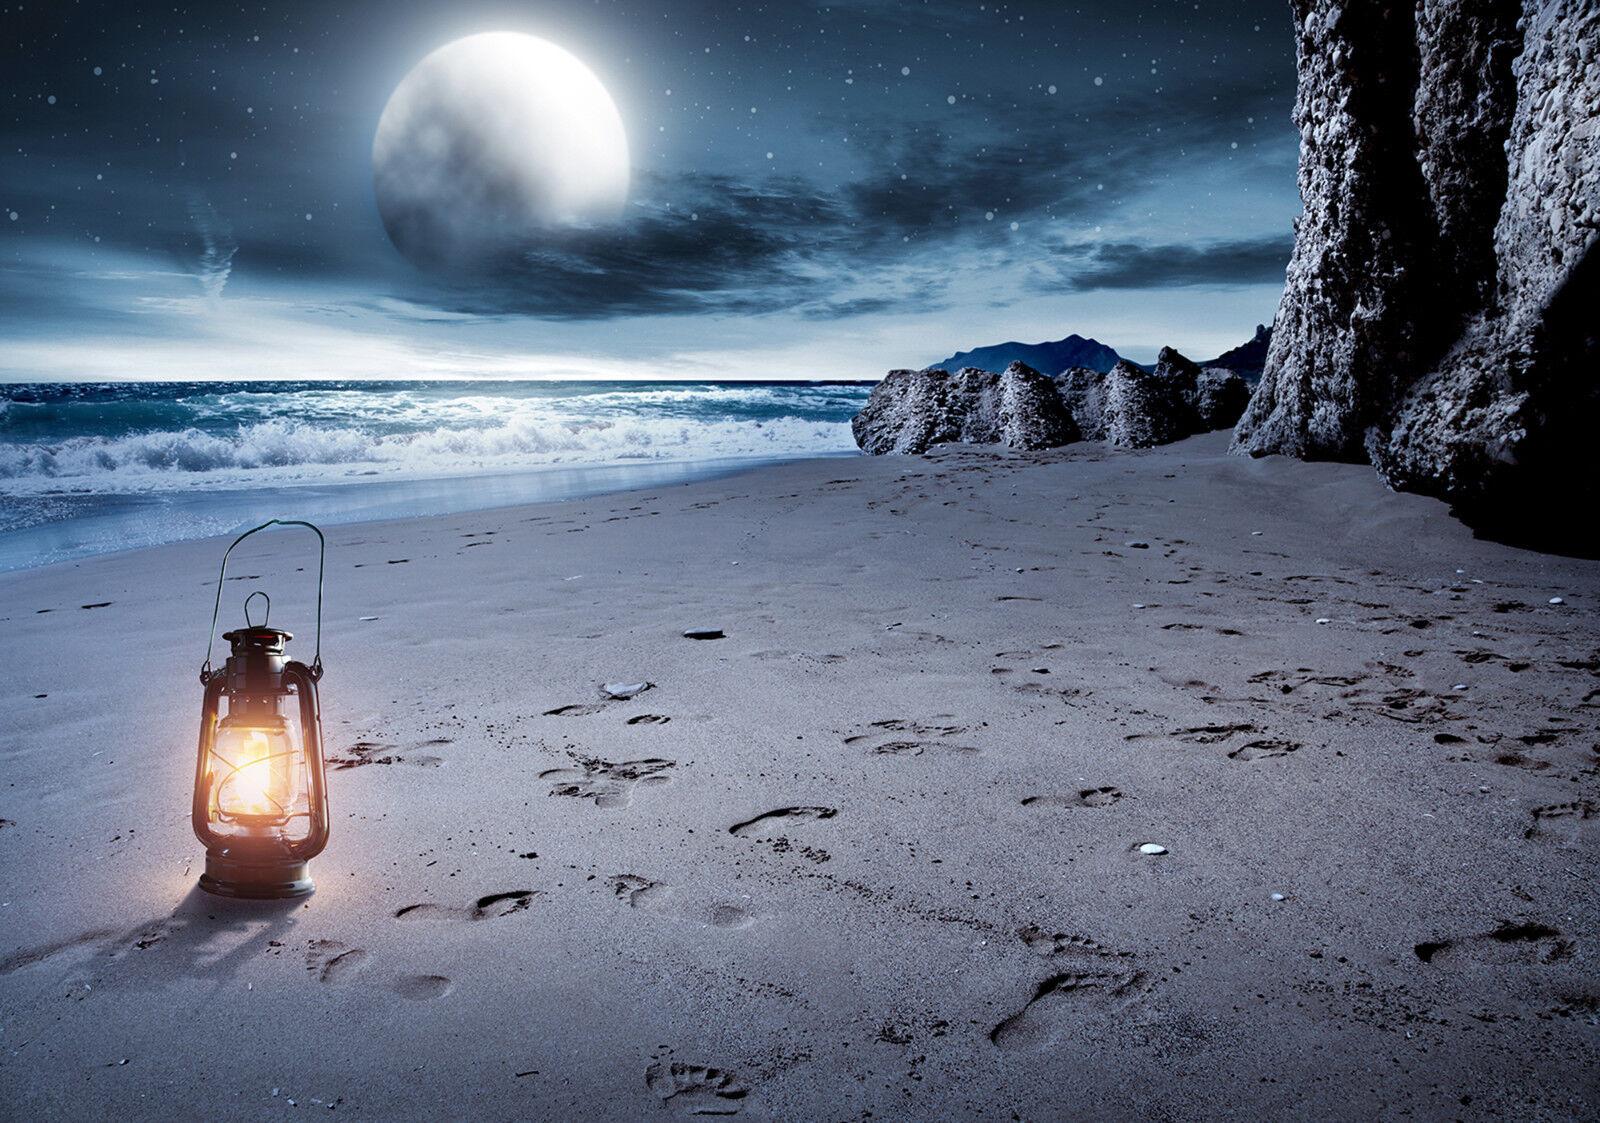 VLIES Fototapete-STRAND-(13016)-Mond Wellen Meer Beach Küste Kliff Wolken Berge